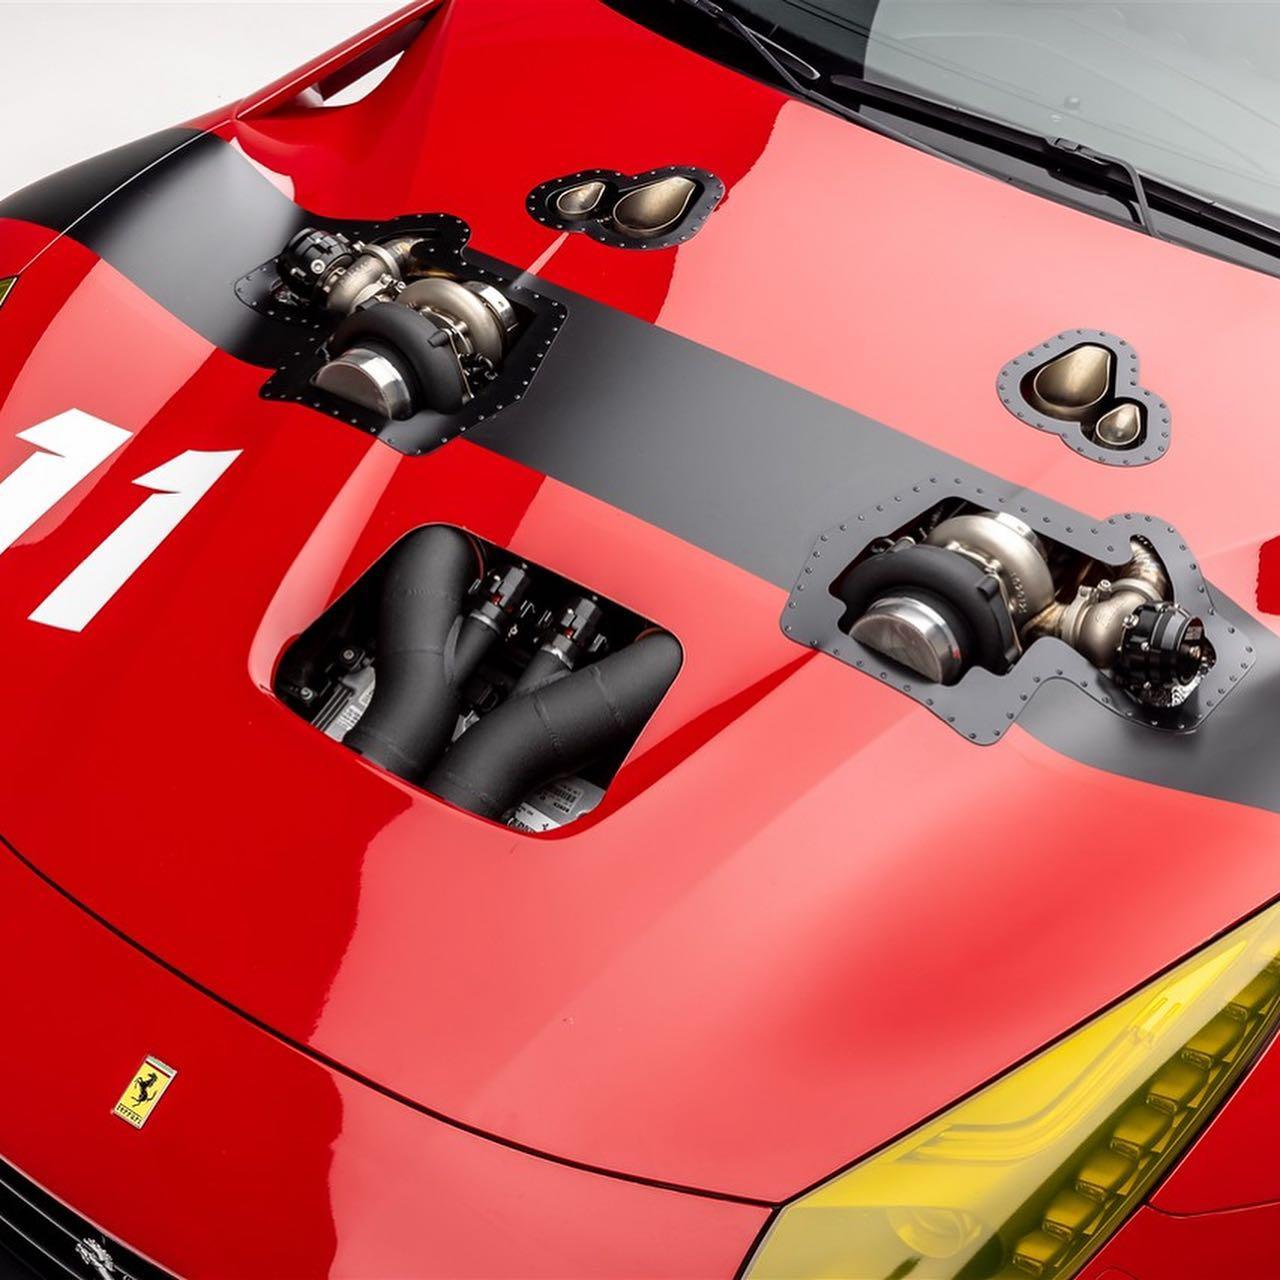 Twin-Turbo-Ferrari-F12-Berlinetta-by-Daily-Driven-Exotics-11